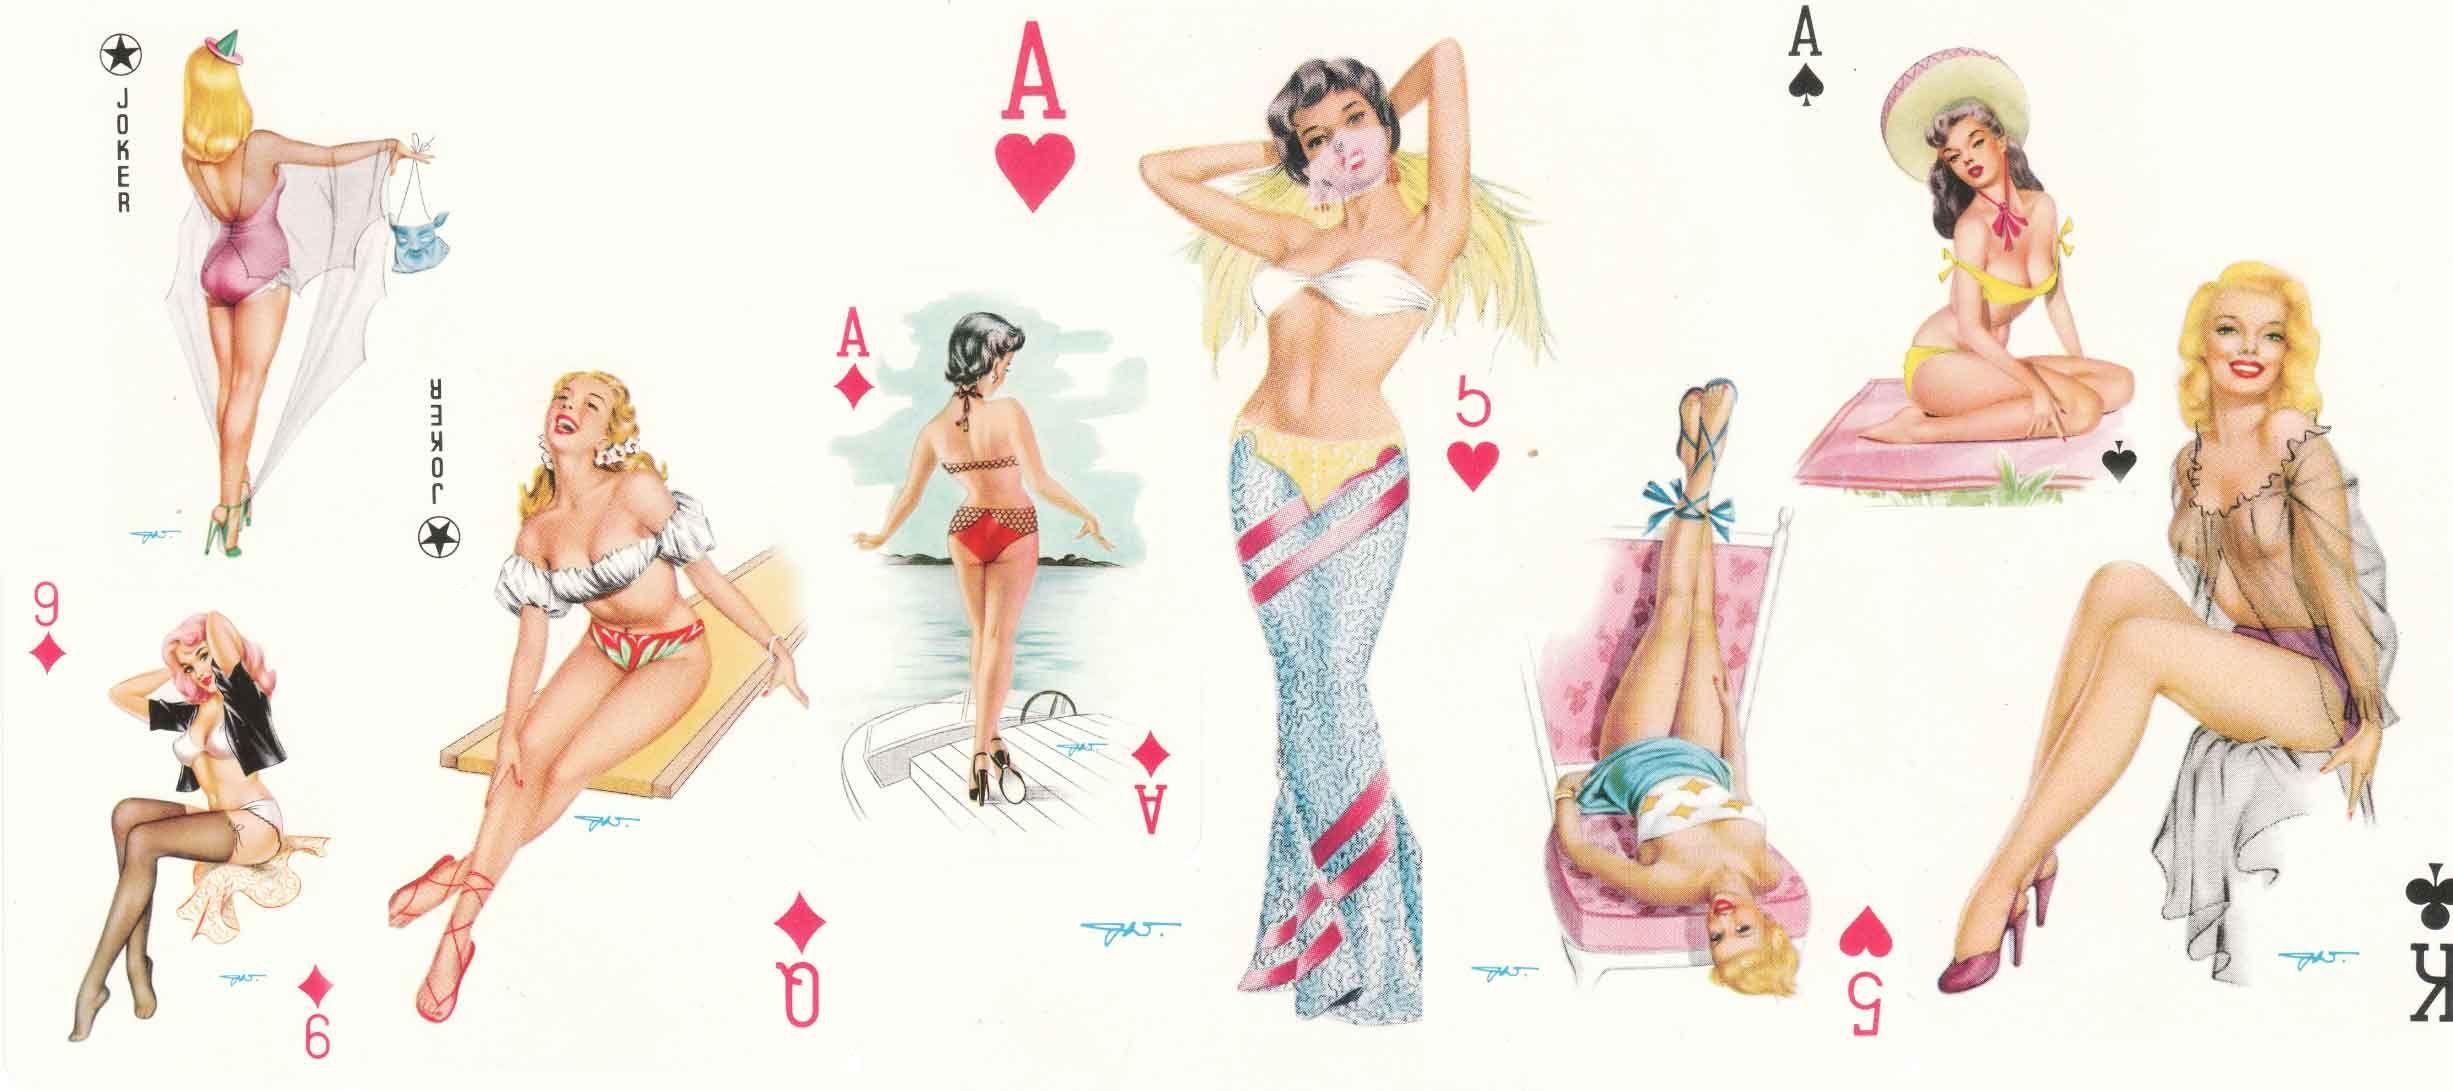 Girl playing card